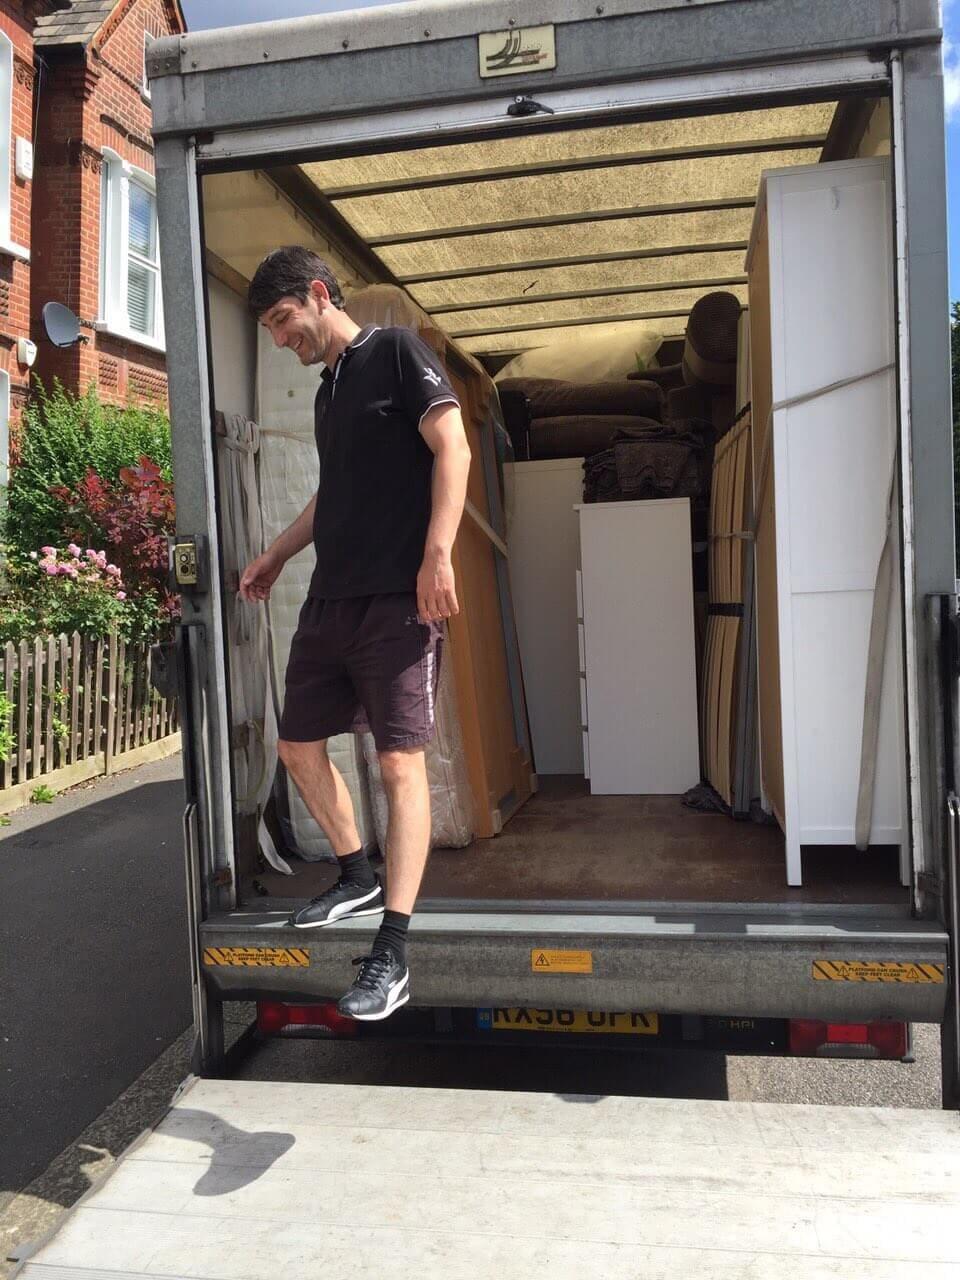 W1 van for hire in Marylebone